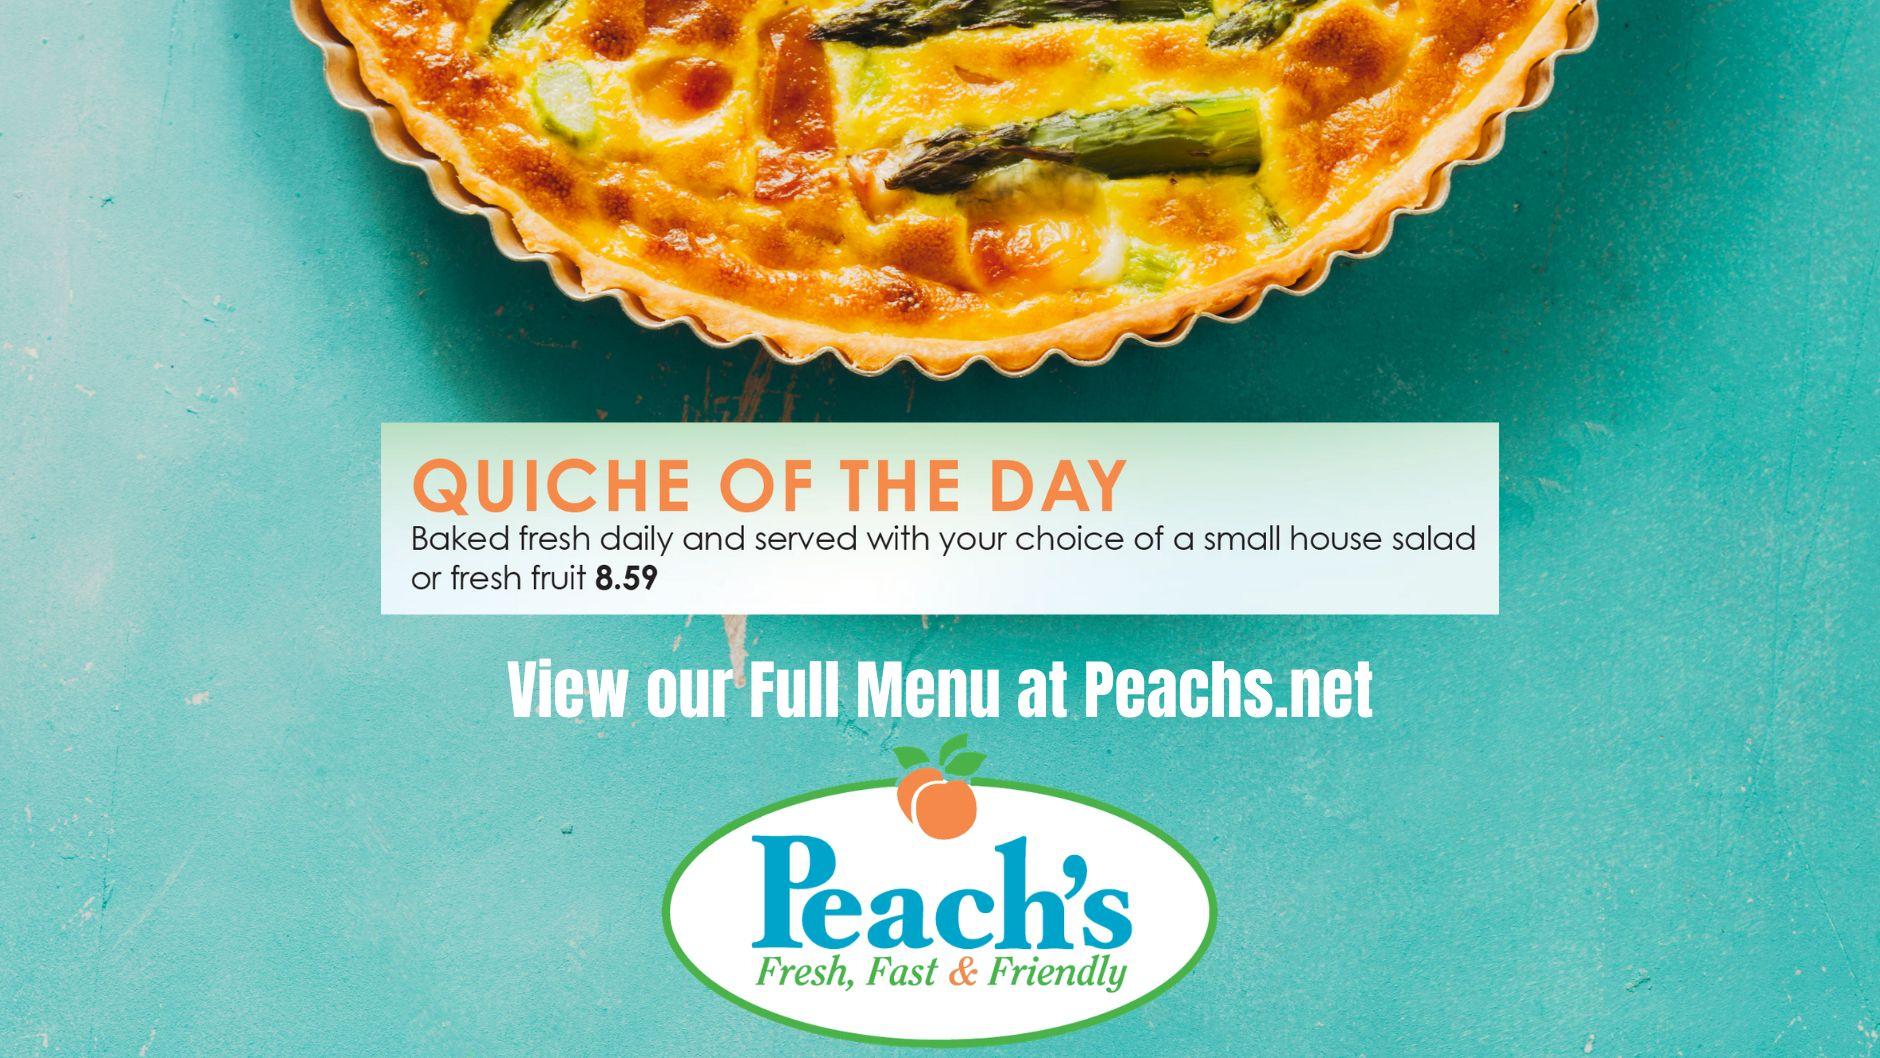 peachs_quiche.png